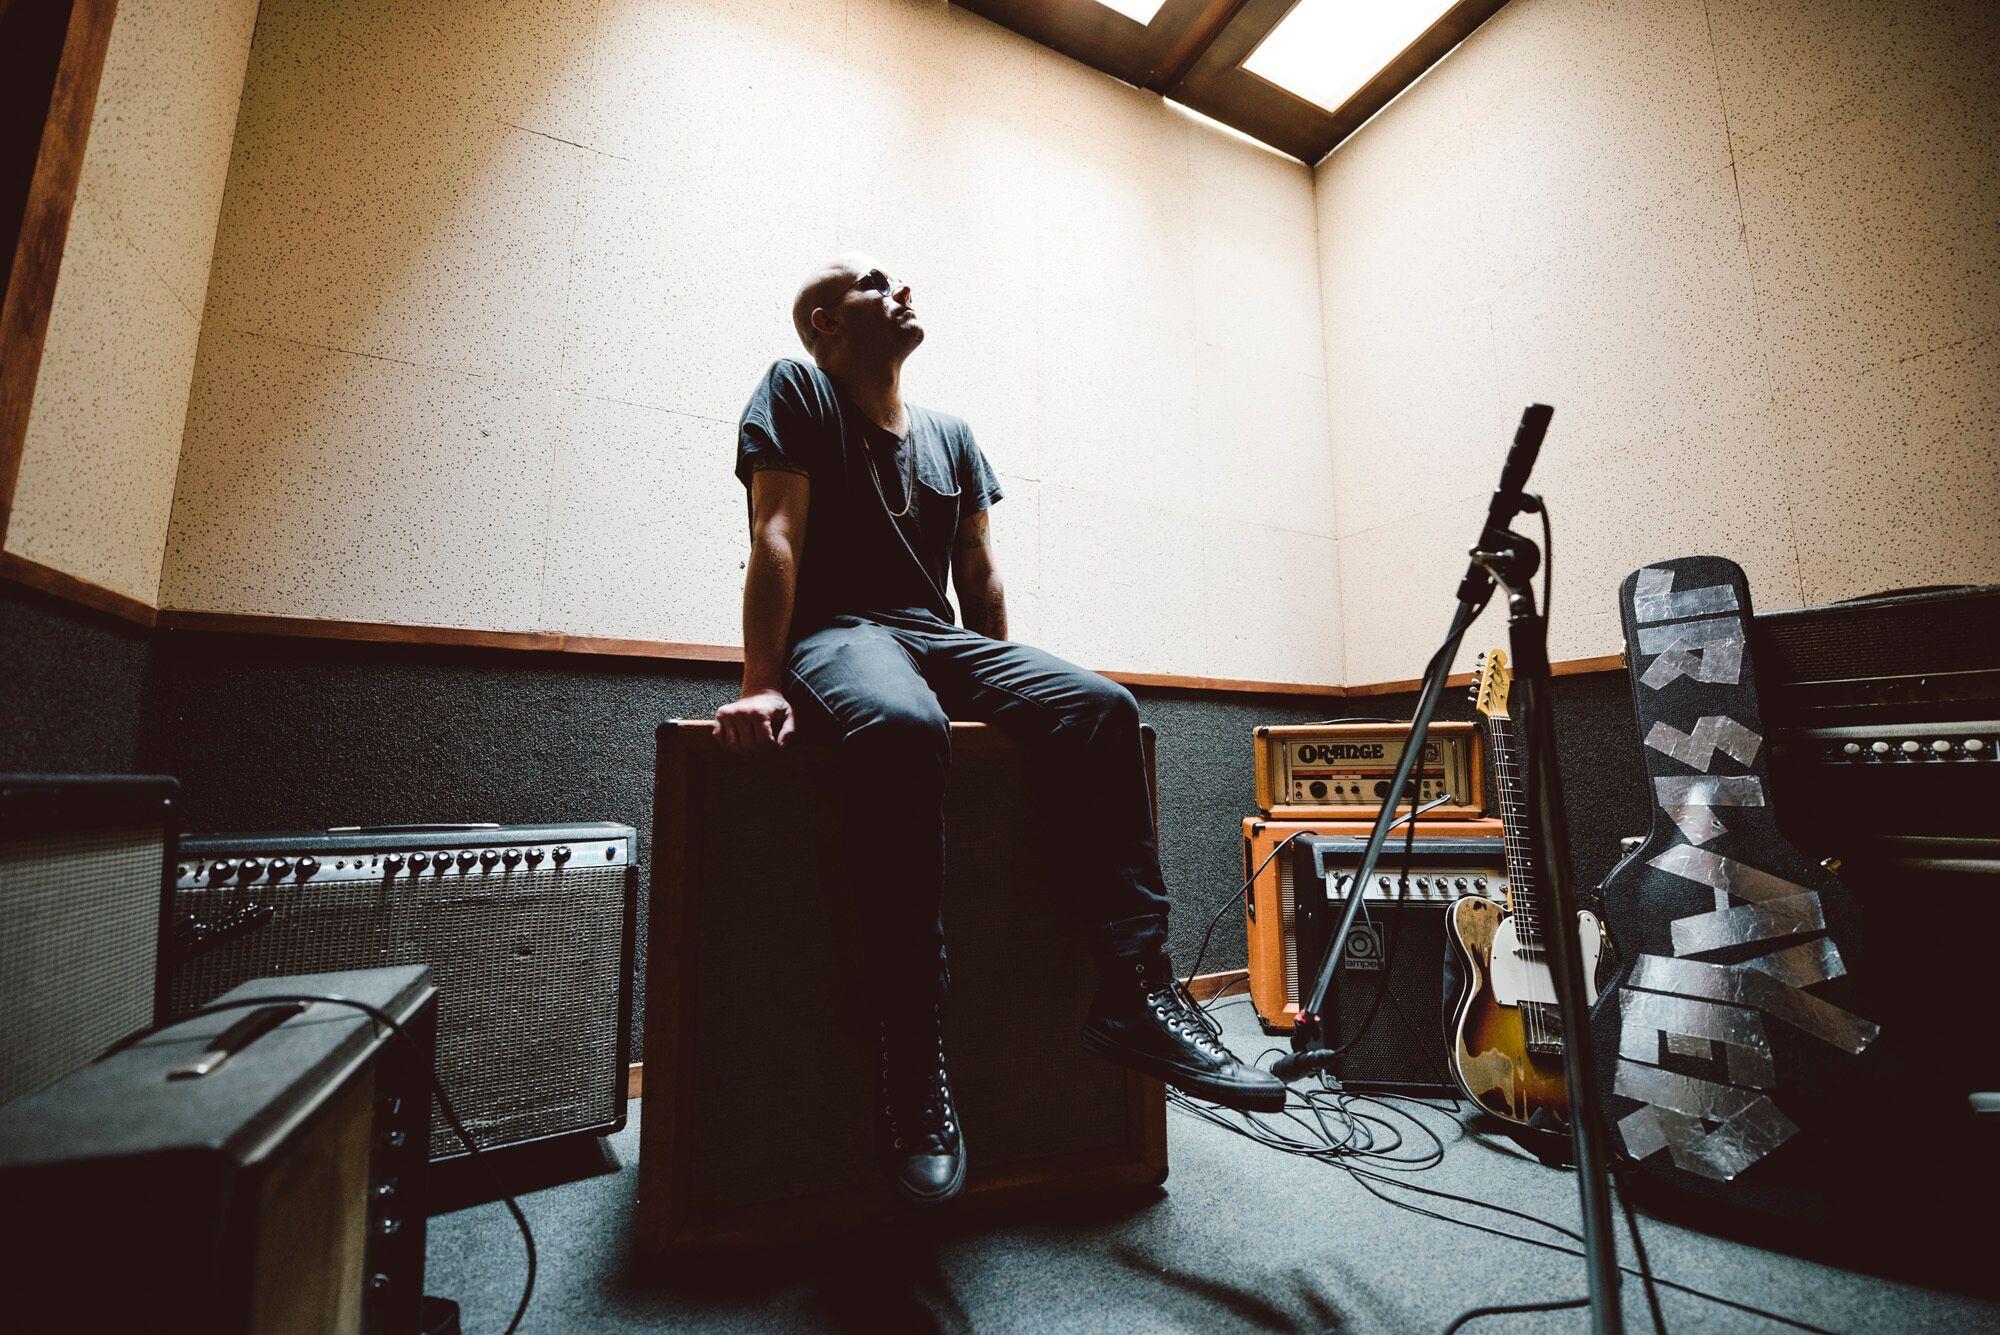 jr-slayer-in-studio-zane-roessell-5-05-2018-edit-6-2095_preview.jpeg